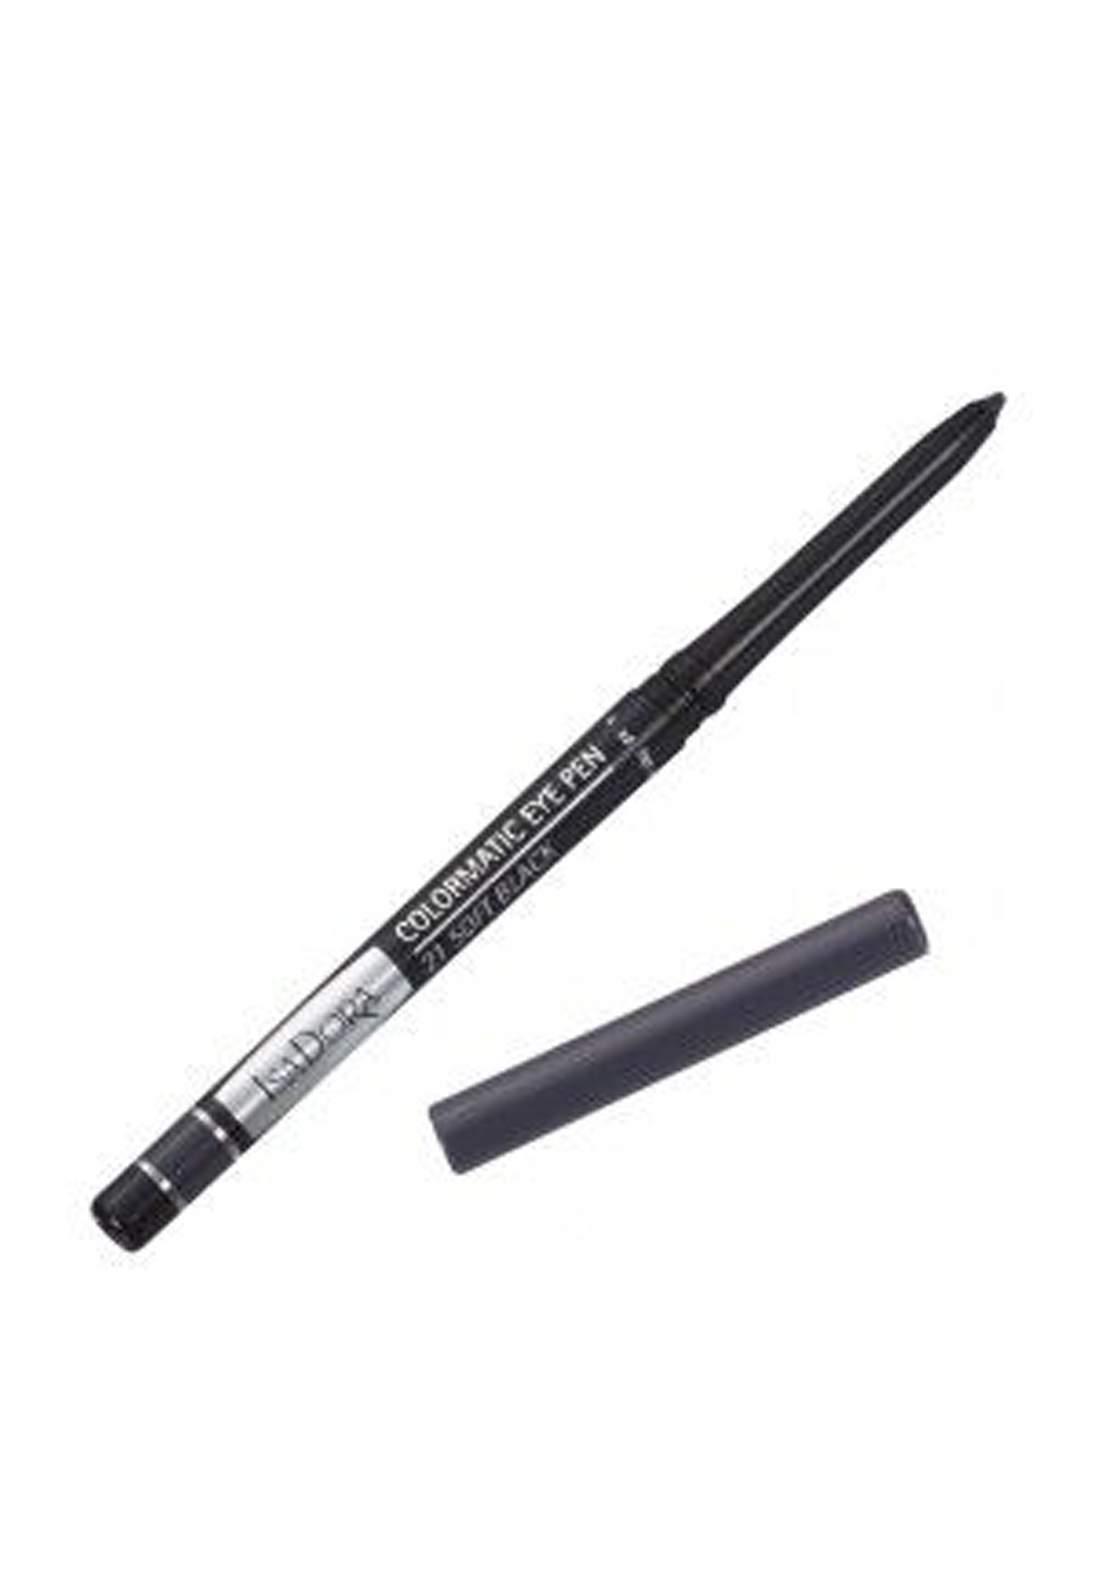 314186 Isadora Colormatic Eye Pen - Soft Black قلم تحديد العين